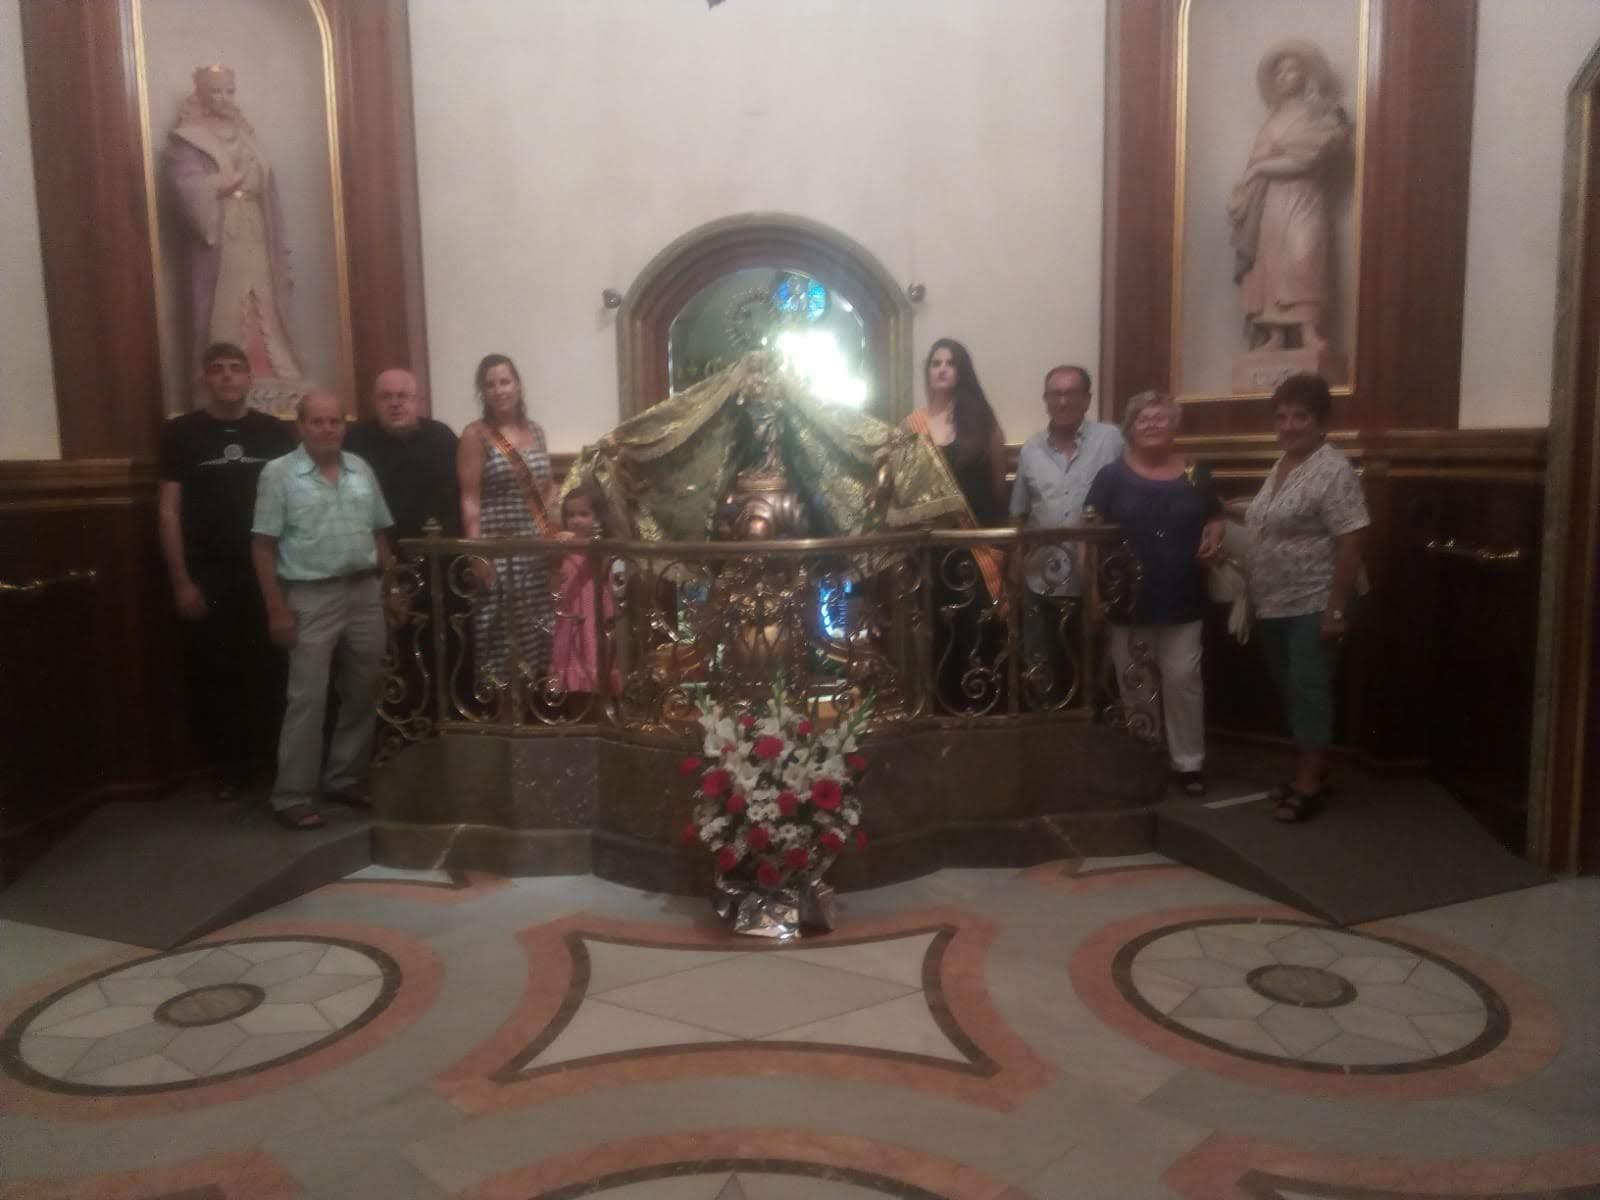 Festivitat de sant Cristòfol al Santuari